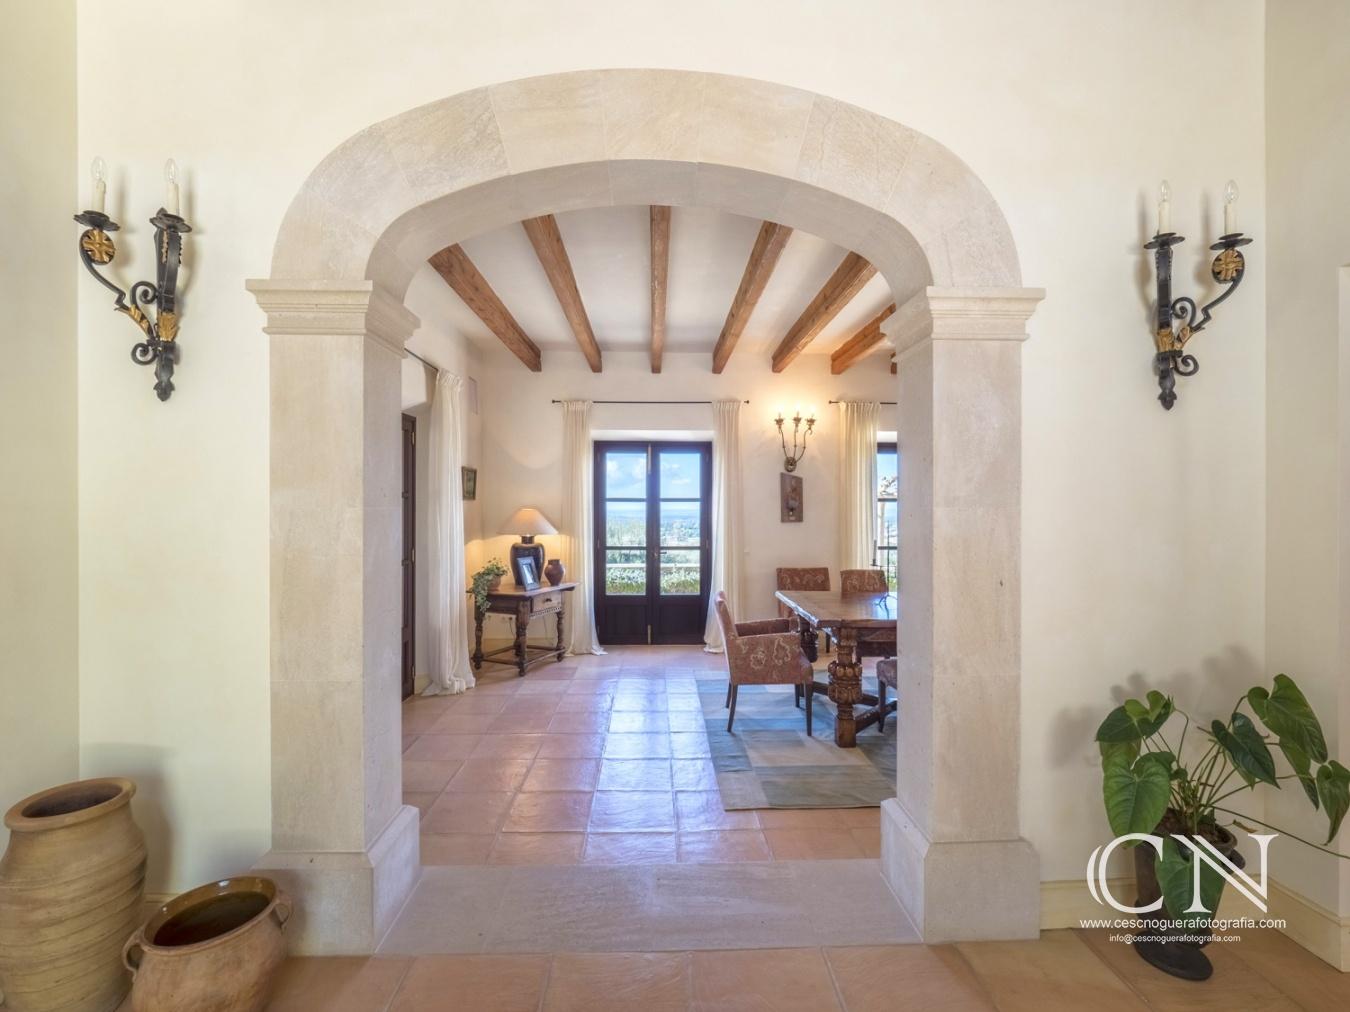 Villa rustica Cas Concos - Cesc Noguera Fotografia,  Architectural & Interior design photographer / Landscape Photography.